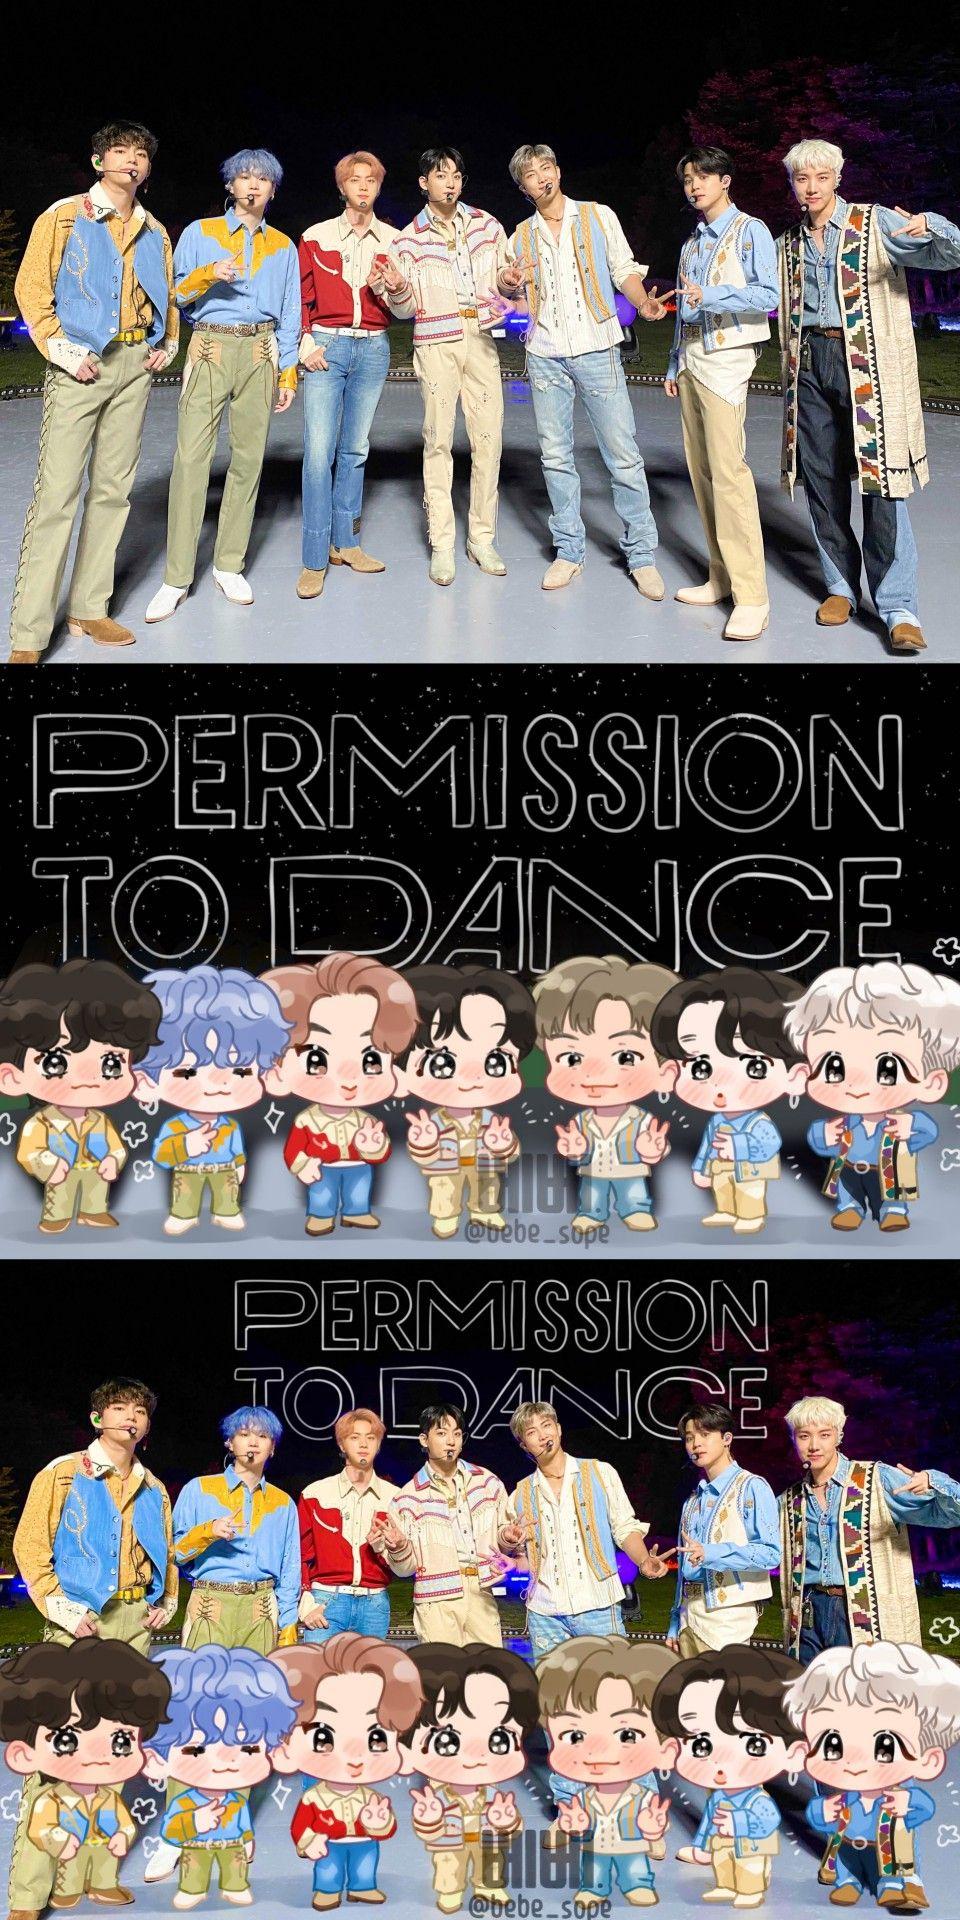 Bts Permission To Dance In 2021 Bts Fanart Bts Boys Fan Art Bts wallpaper 2021 permission to dance